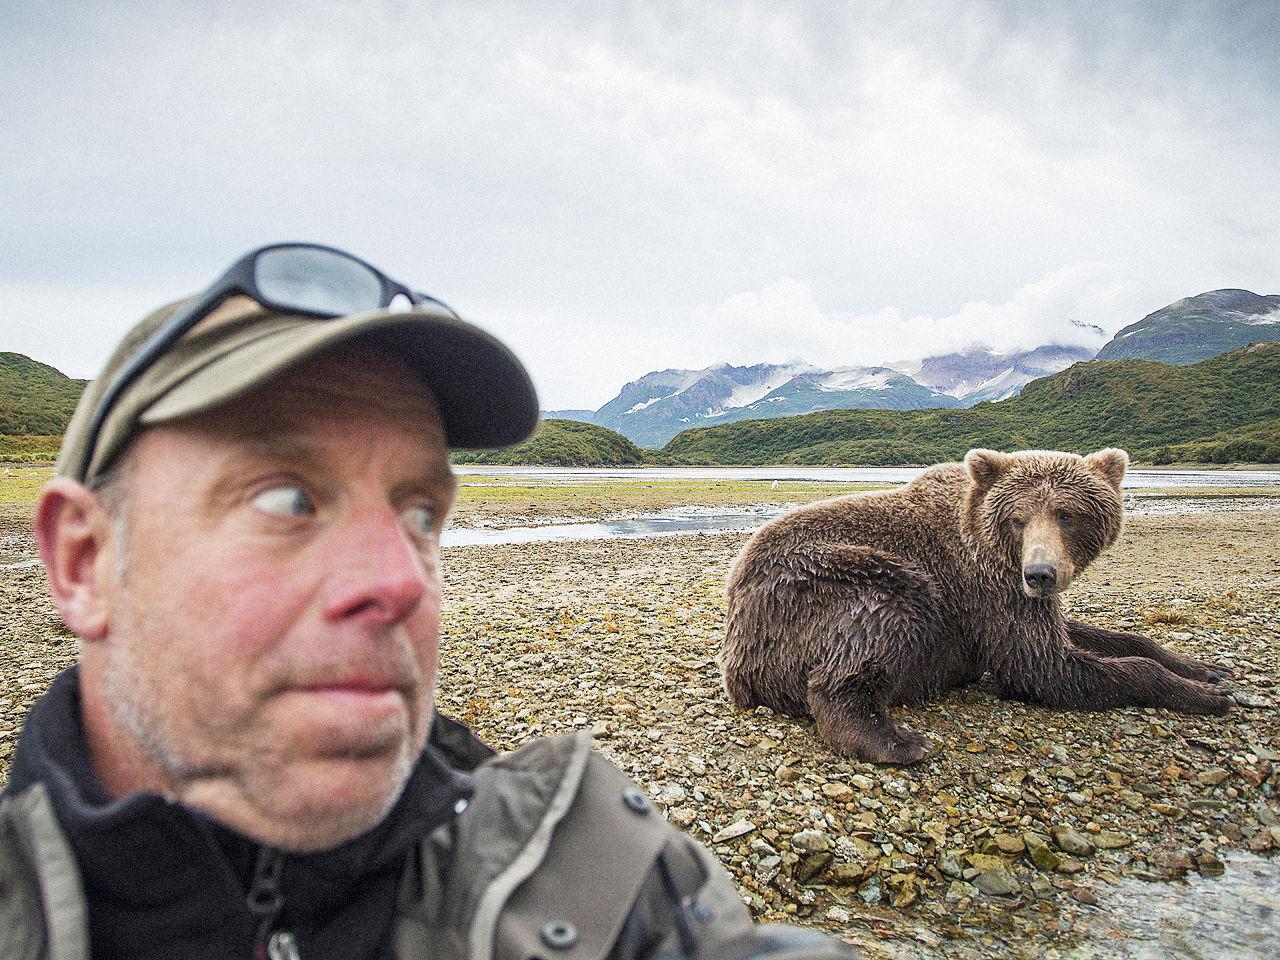 Selfies vs. Sharks: what is more dangerous